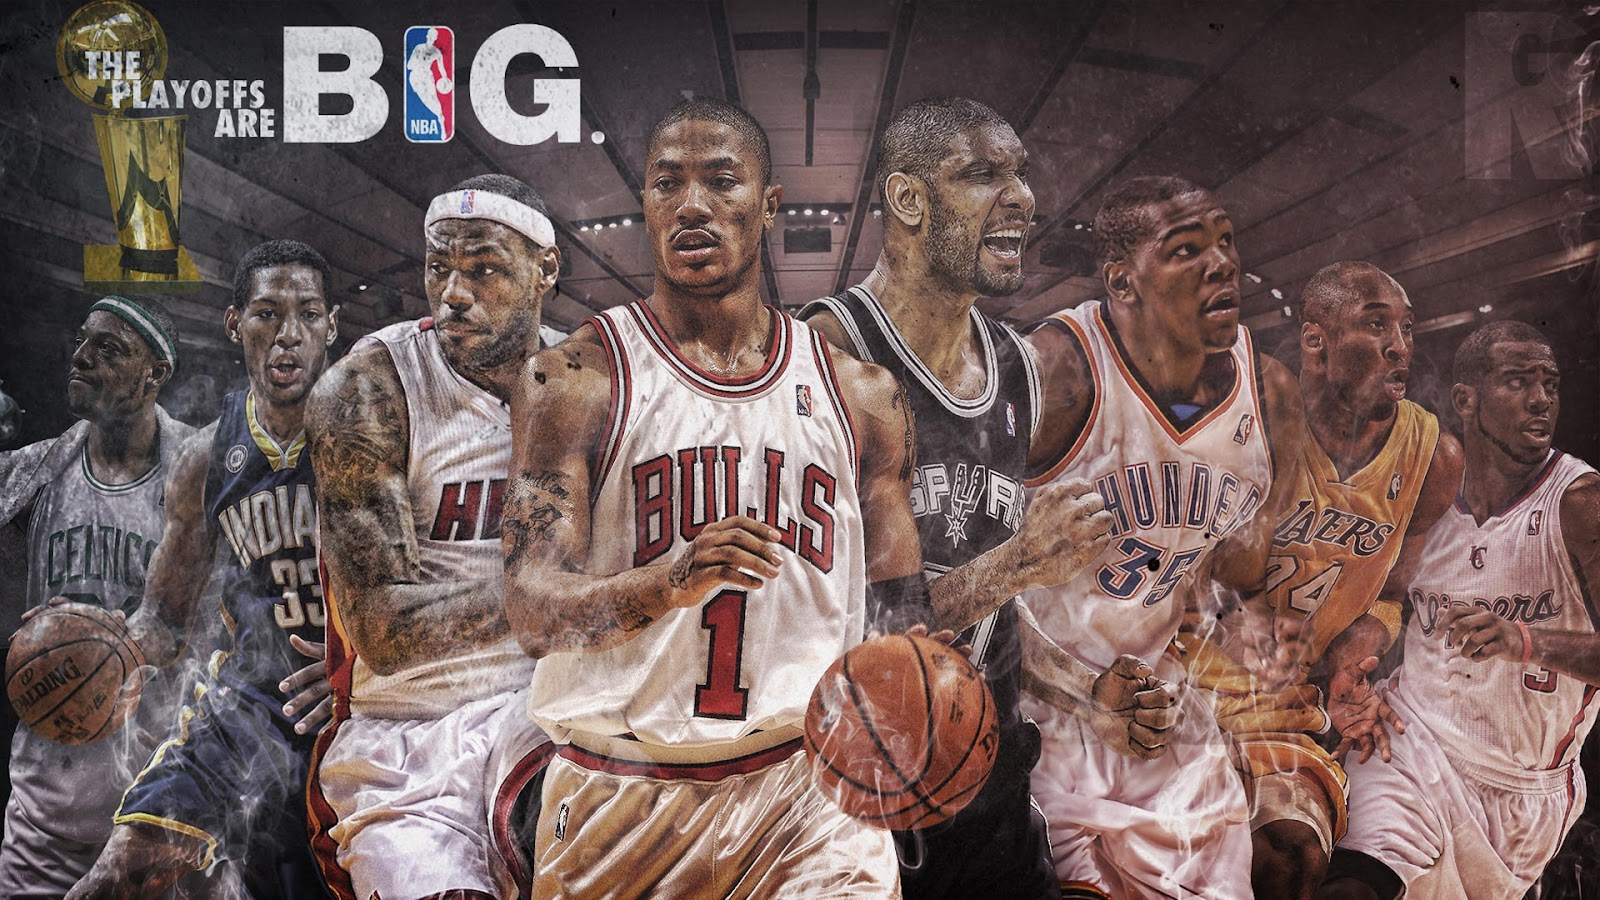 http://2.bp.blogspot.com/-113wnRrChE4/T6f71r40C4I/AAAAAAAAALo/1qoJHf4guaM/s1600/2012-NBA-Playoffs-Stars-1920x1080-Wallpaper-BasketWallpapers.com-.jpg